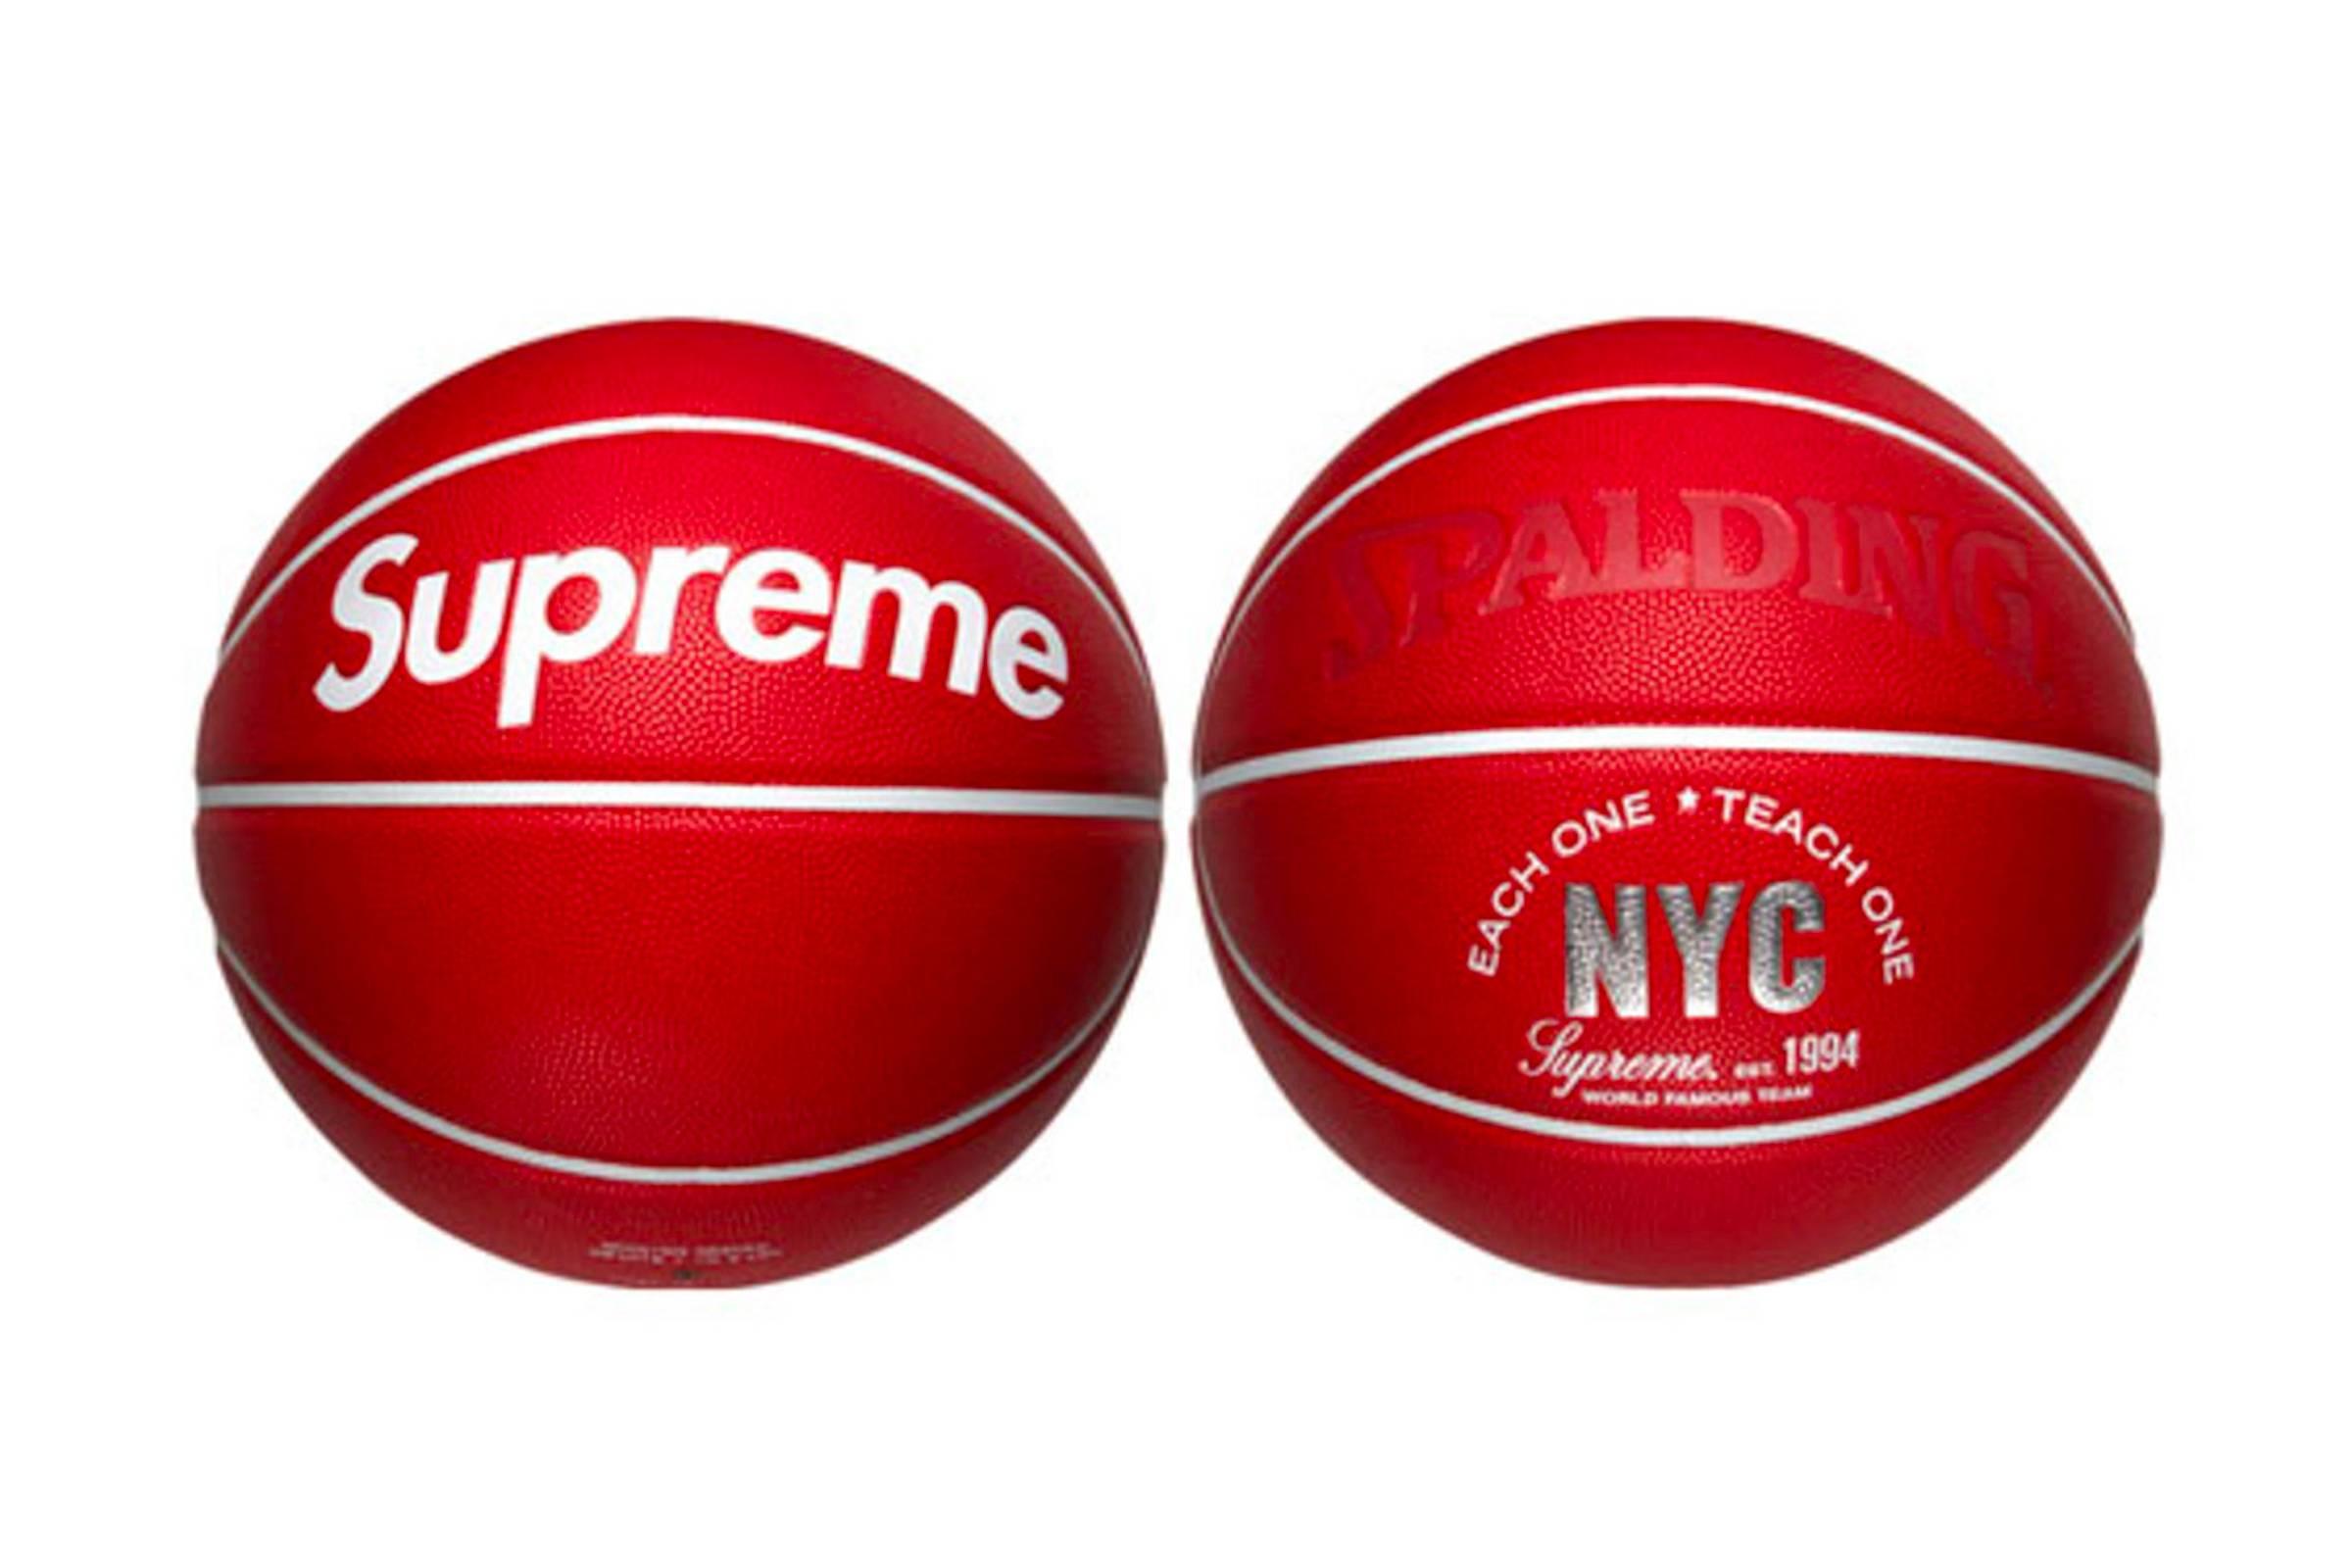 Supreme x Spalding Basketball (2007)